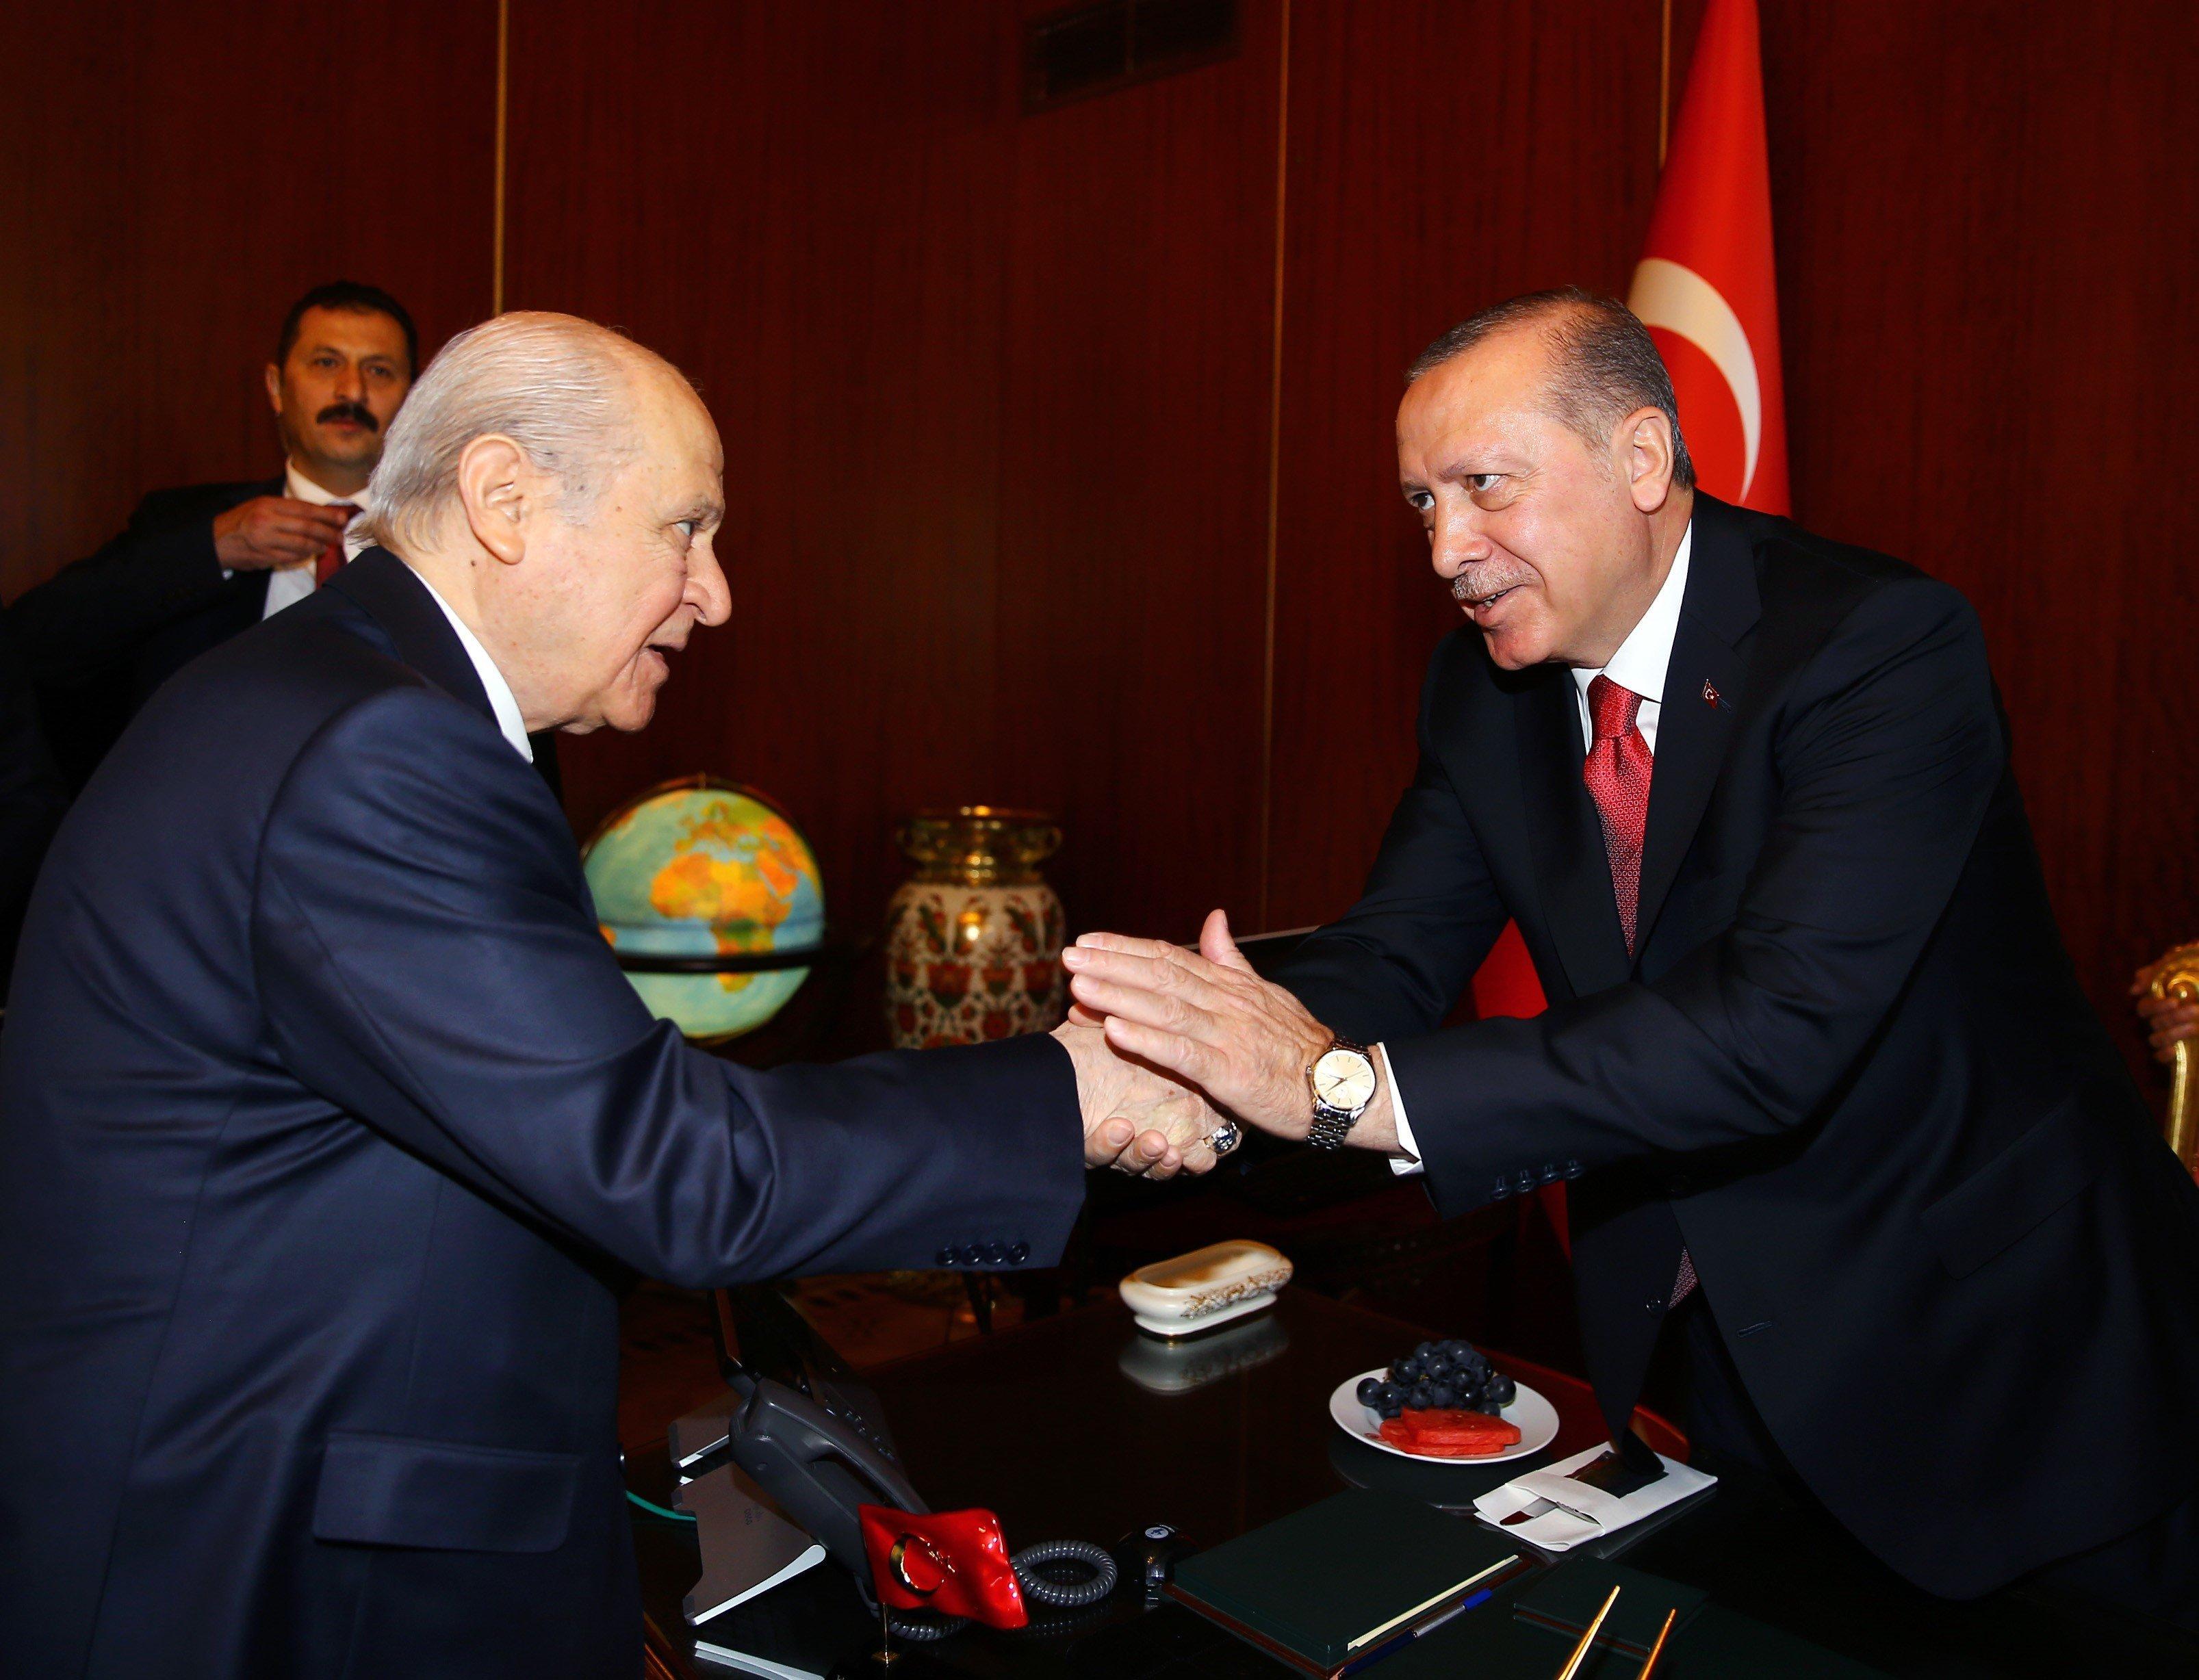 Erdogan gibt Bündnis mit rechtem Politiker bekannt